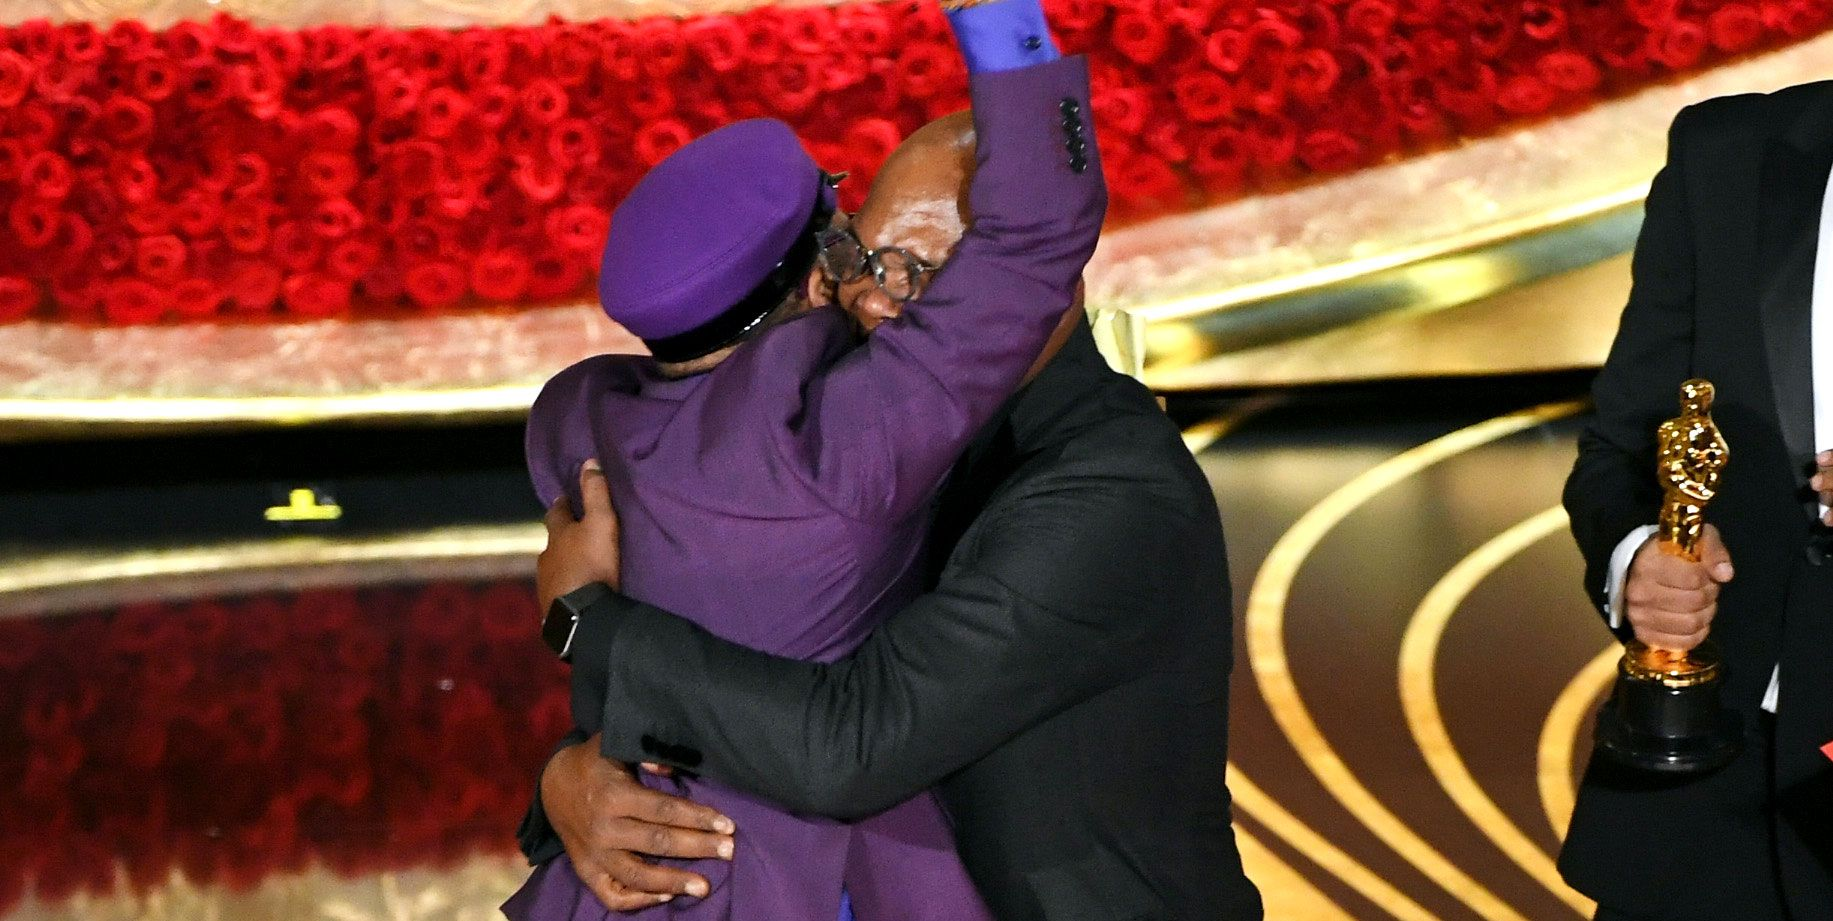 Spike Lee jumps on Samuel L. Jackson as he wins Best Adapted Screenplay award for BlacKkKlansman